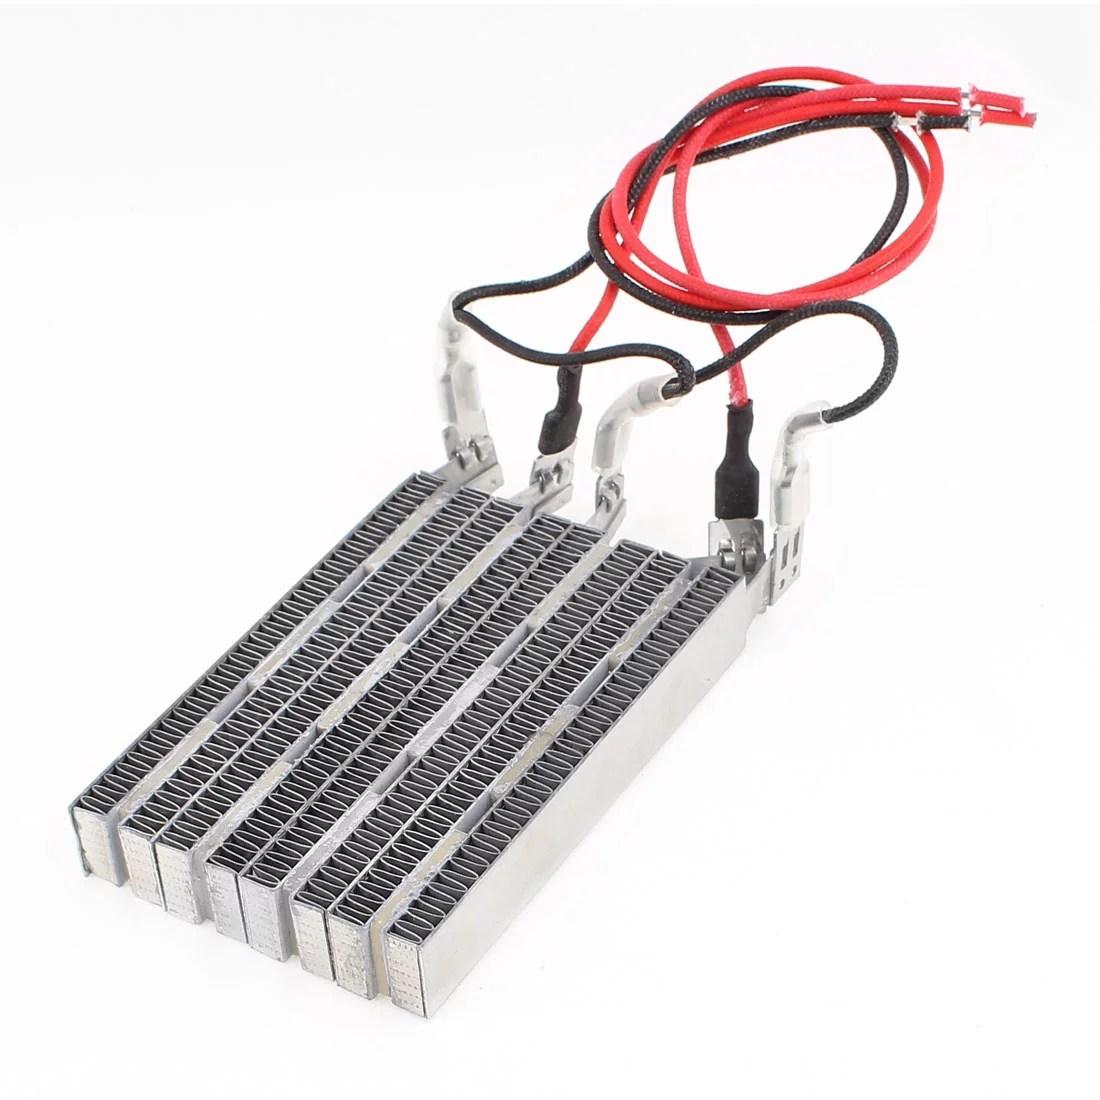 Ac 220v 1200w Electric Ceramic Thermostatic Ptc Heating